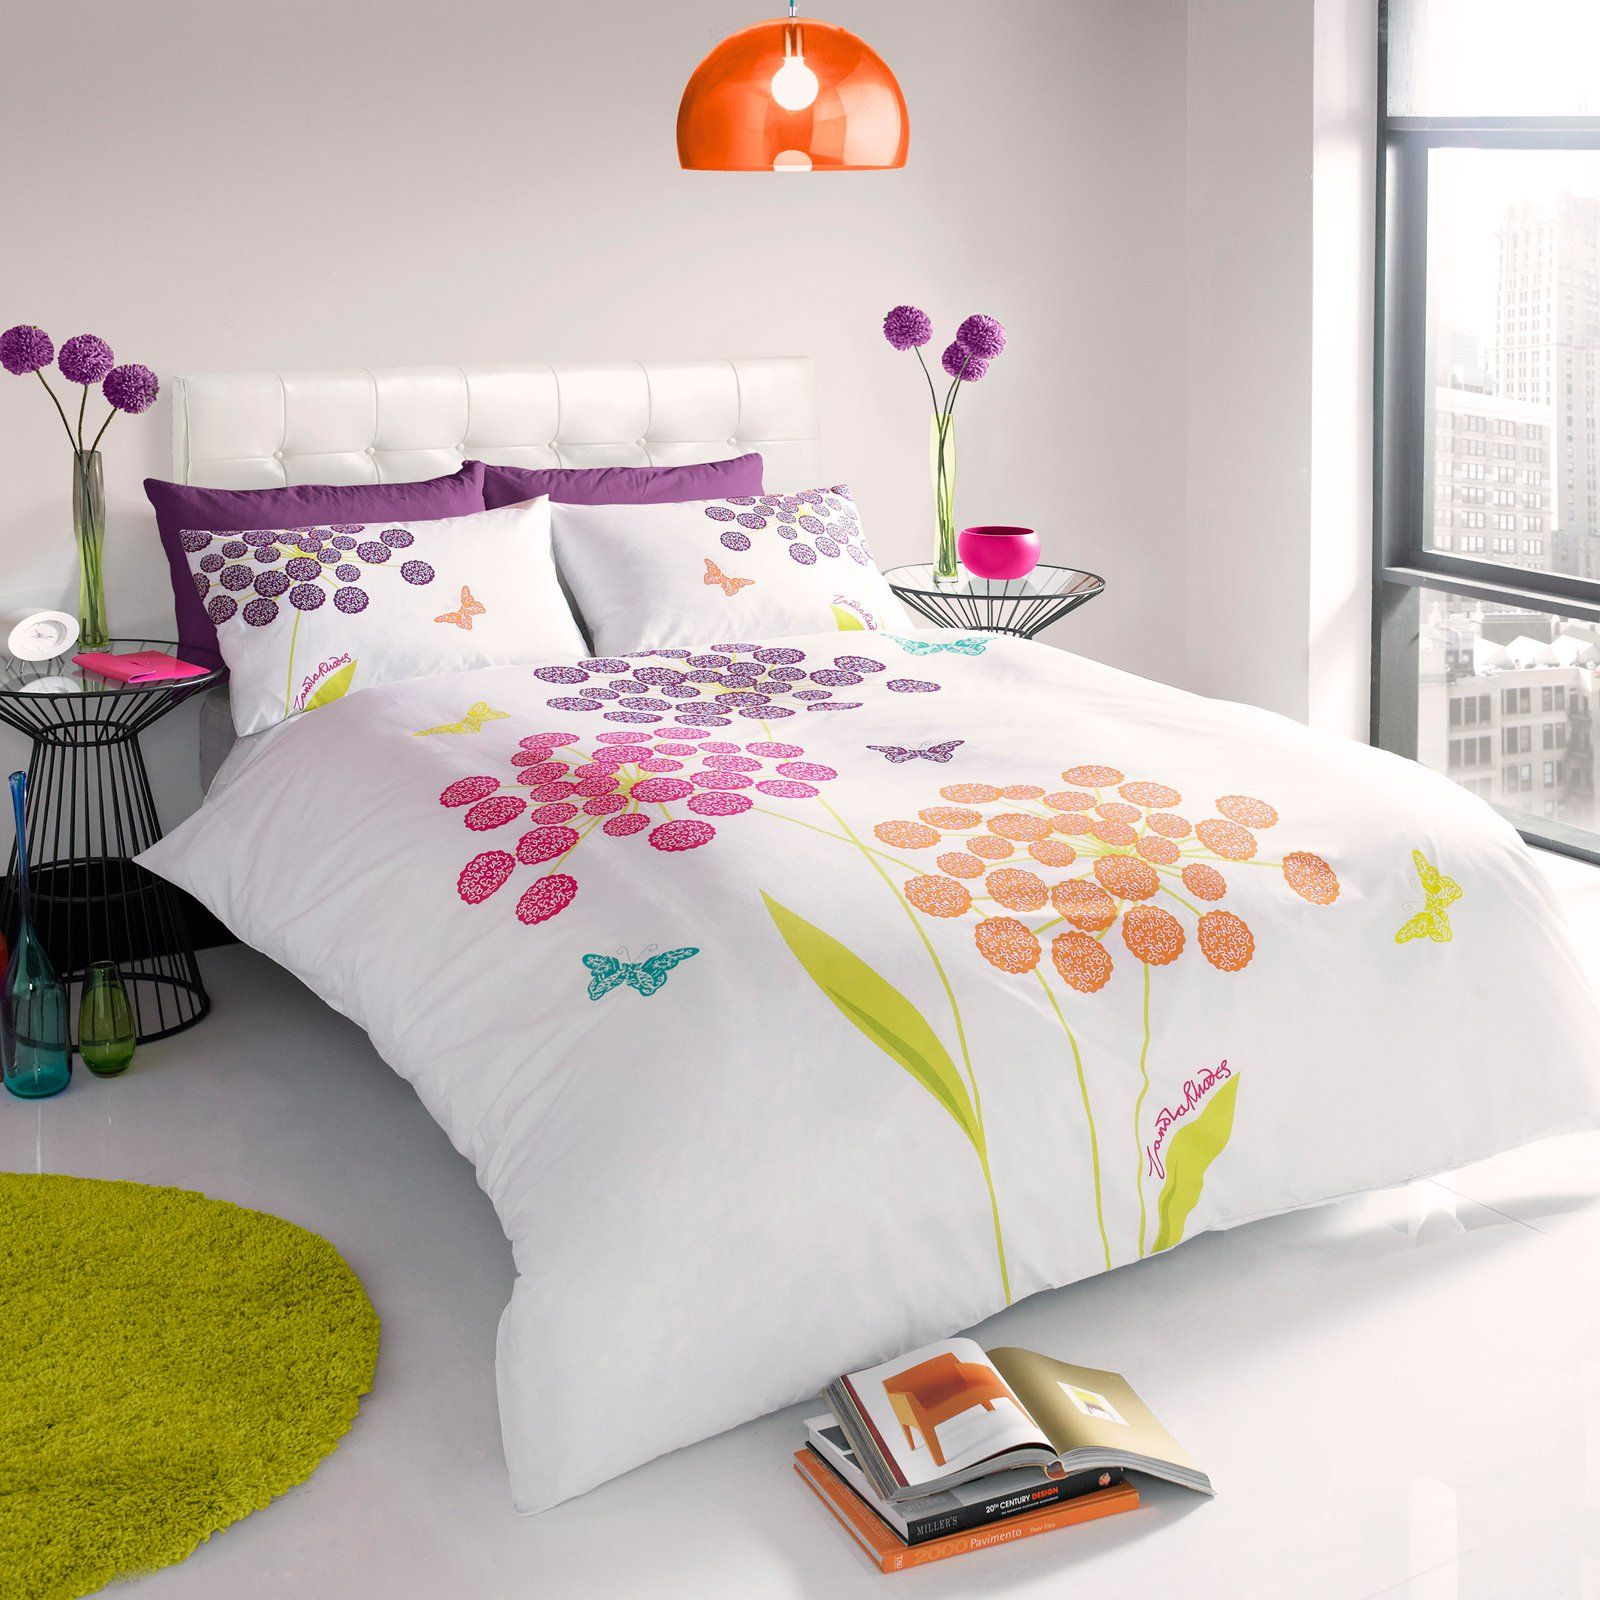 Zandra Rhodes Bedding Fl Erfly Multi Coloured King Size Duvet Cover Multicoloured